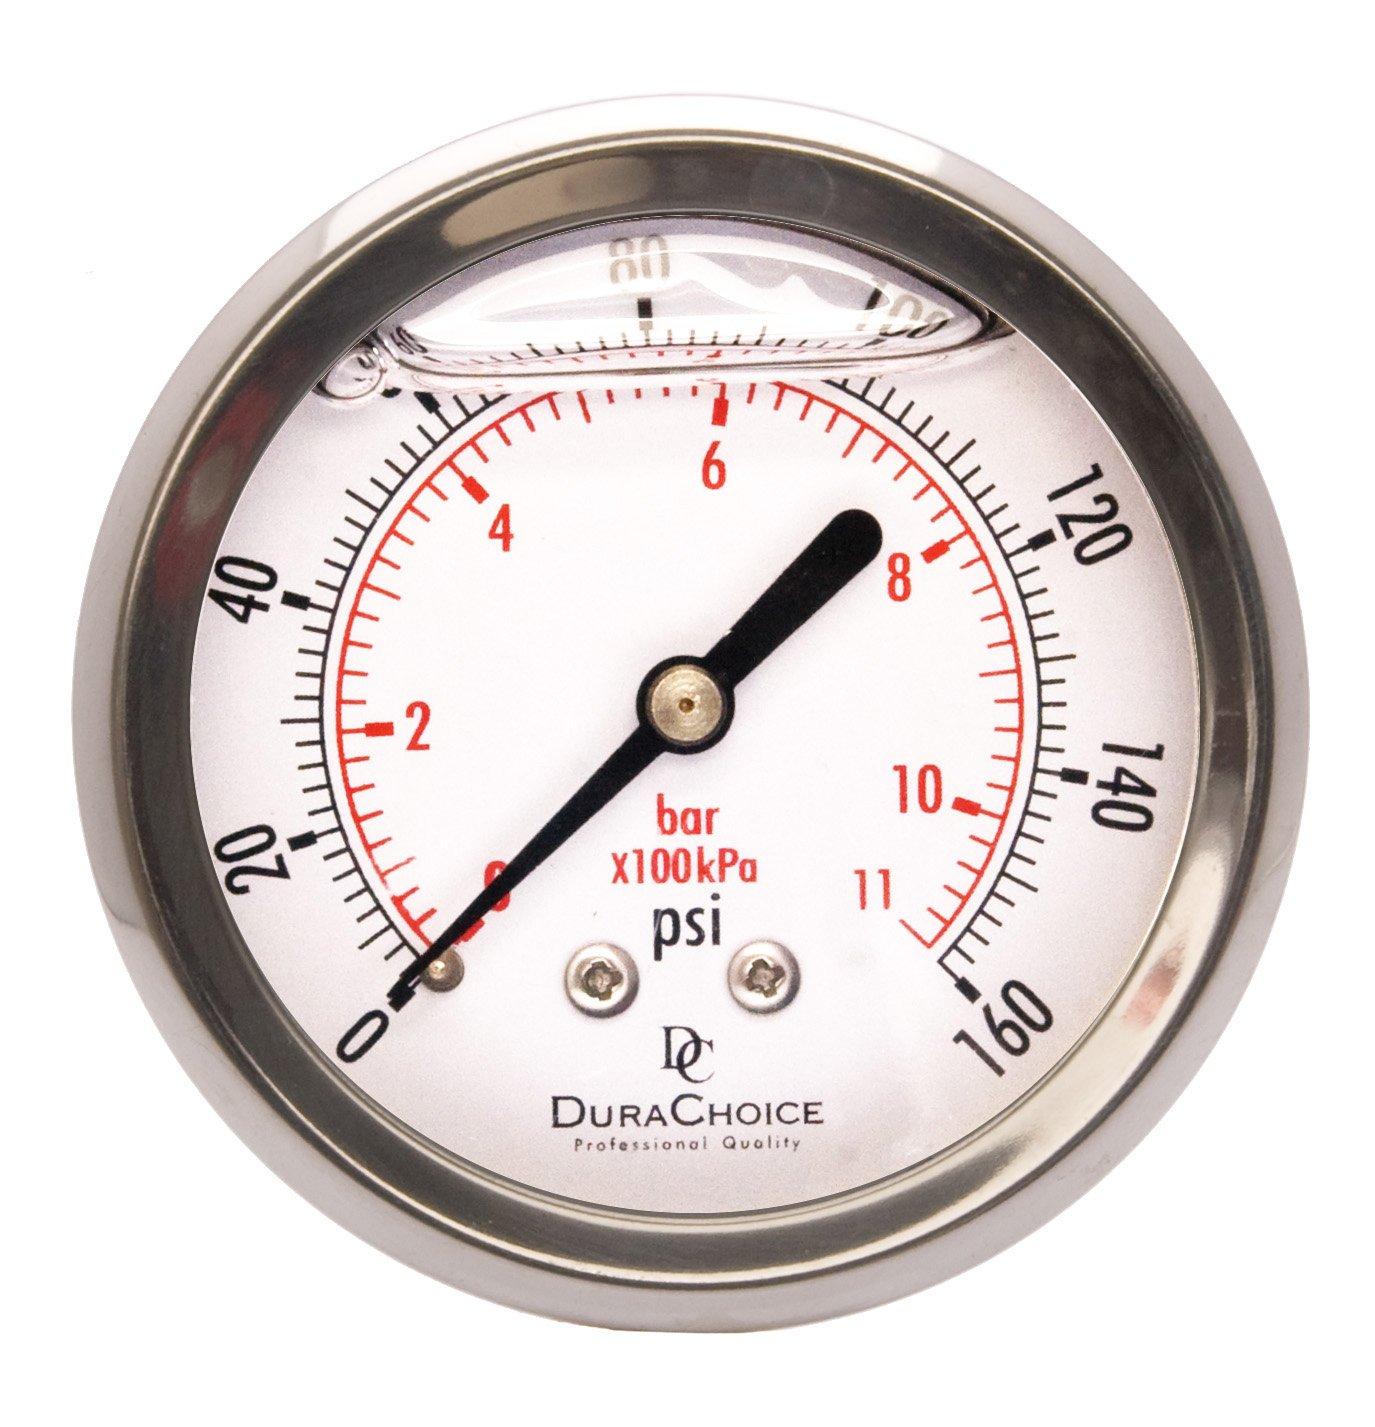 2-1/2'' Liquid Filled Pressure Gauges - Stainless Steel Case, Brass, 1/4'' NPT, Center Back Mount Connection 0-160PSI